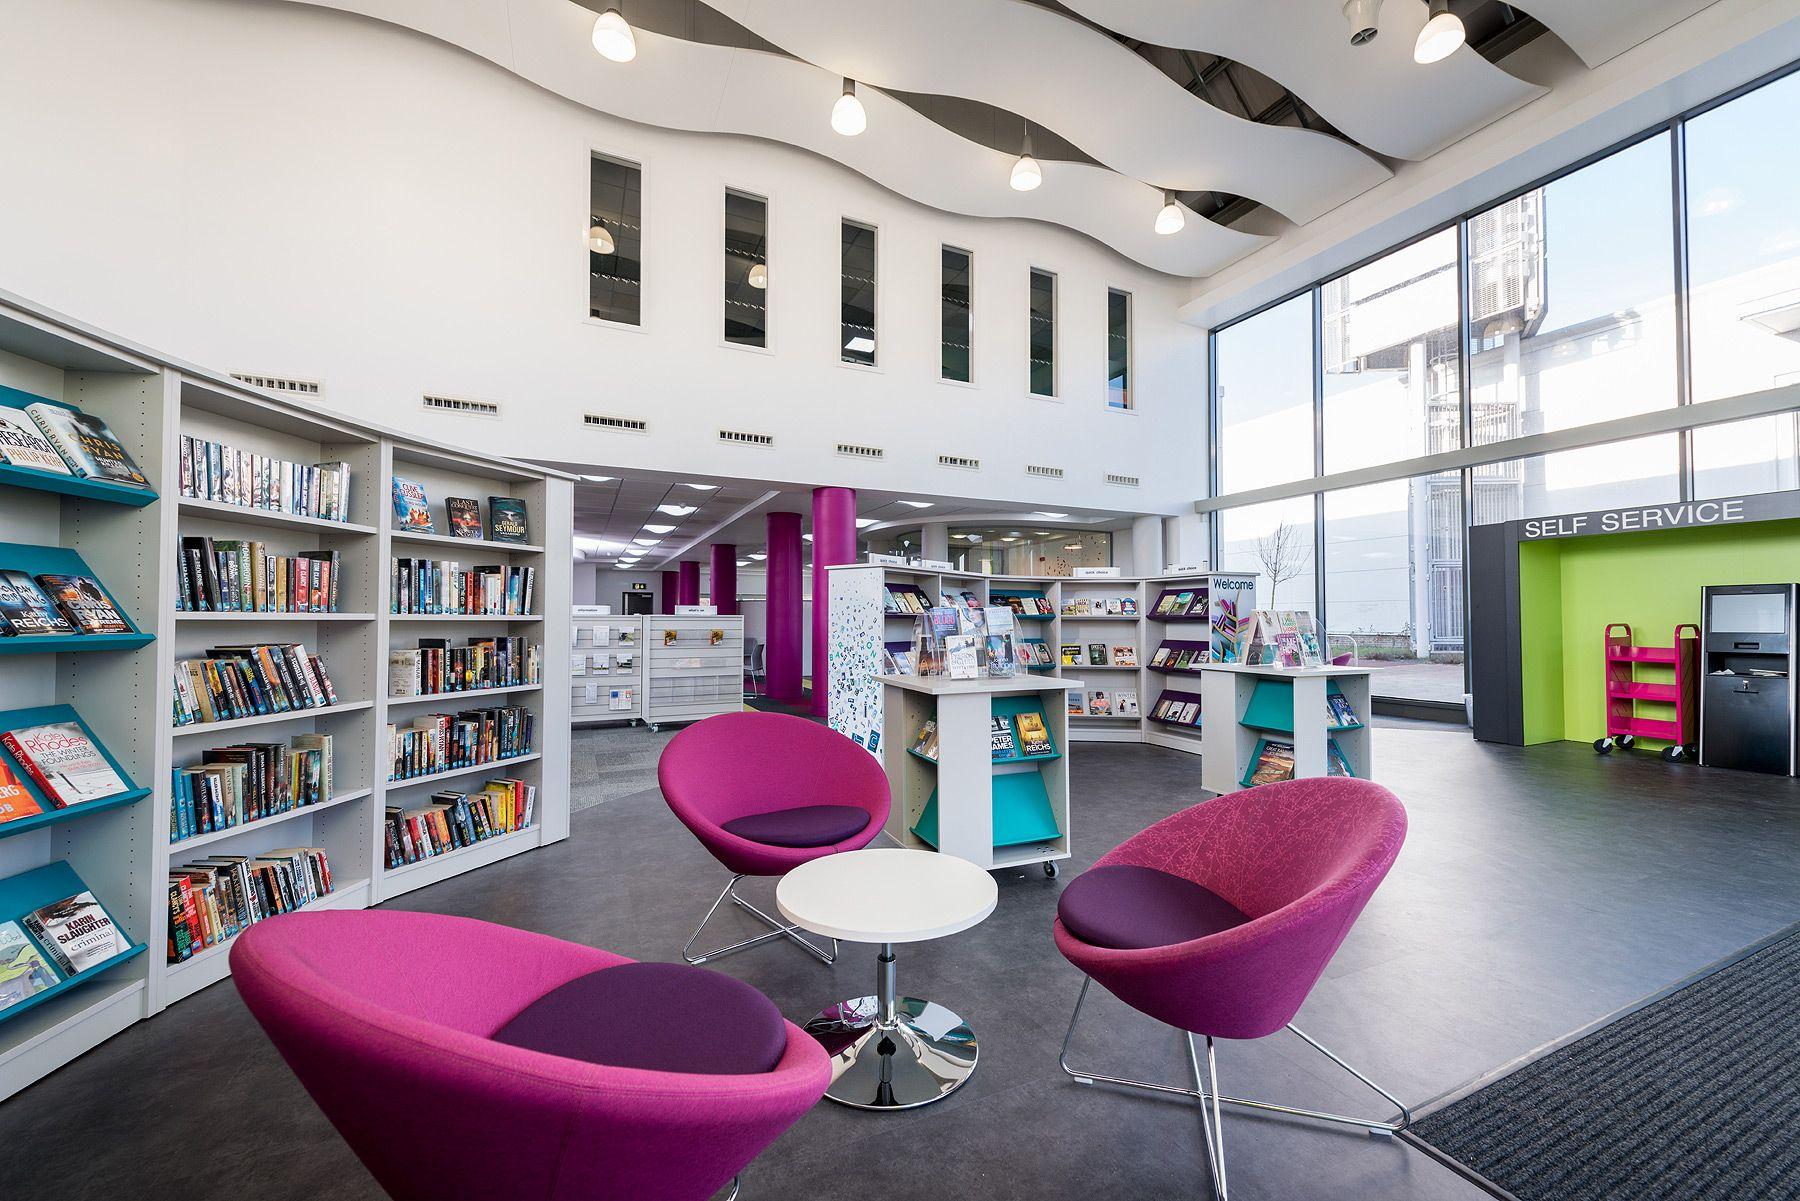 Kingston Library Milton Keynes UK